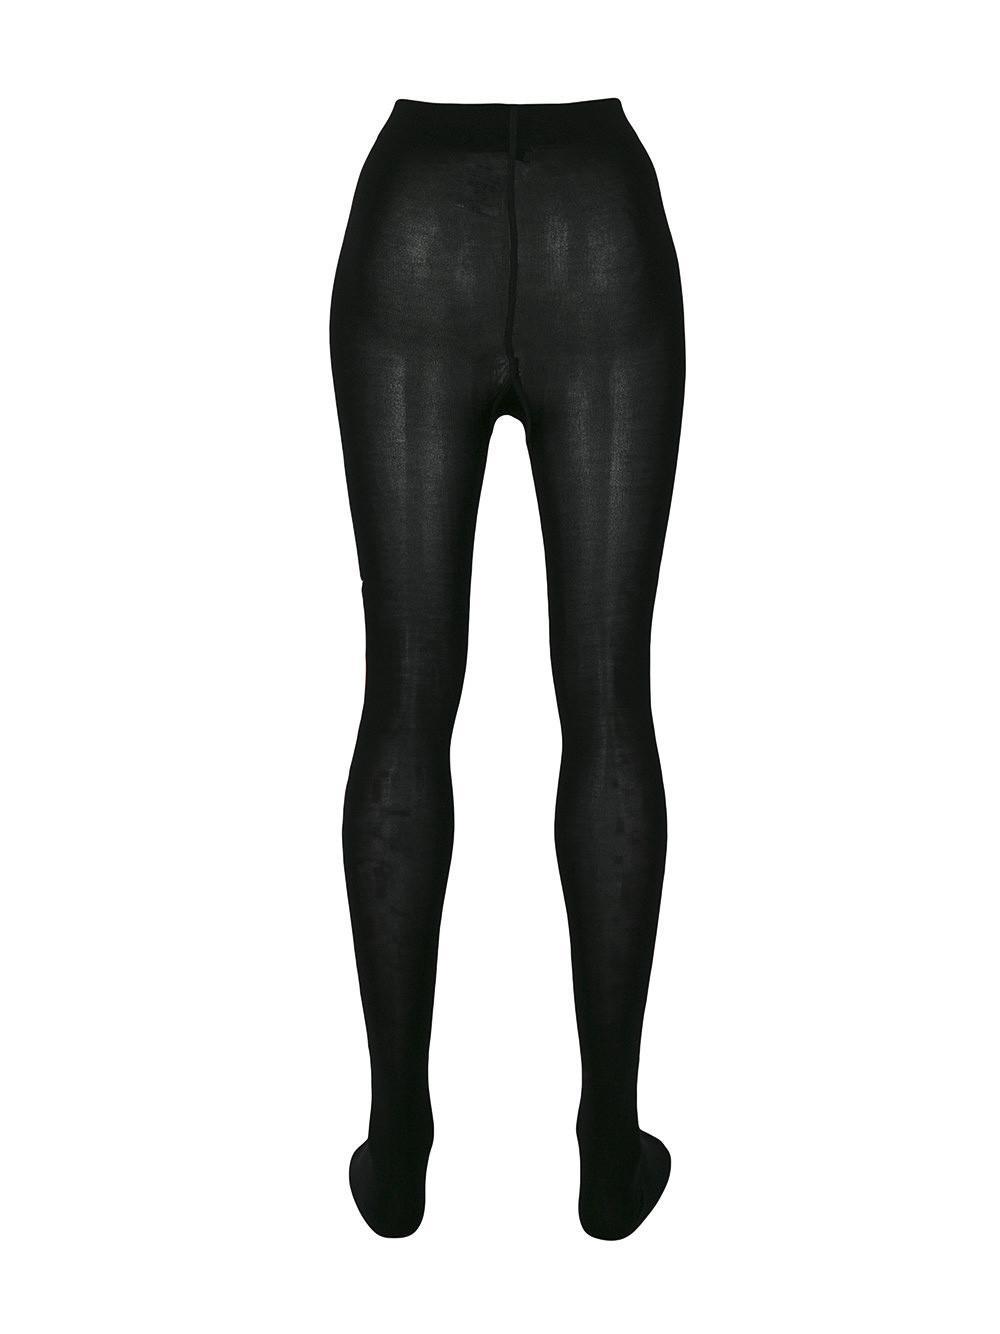 83ee33b54574f Givenchy Logo Print Tights in Black - Lyst